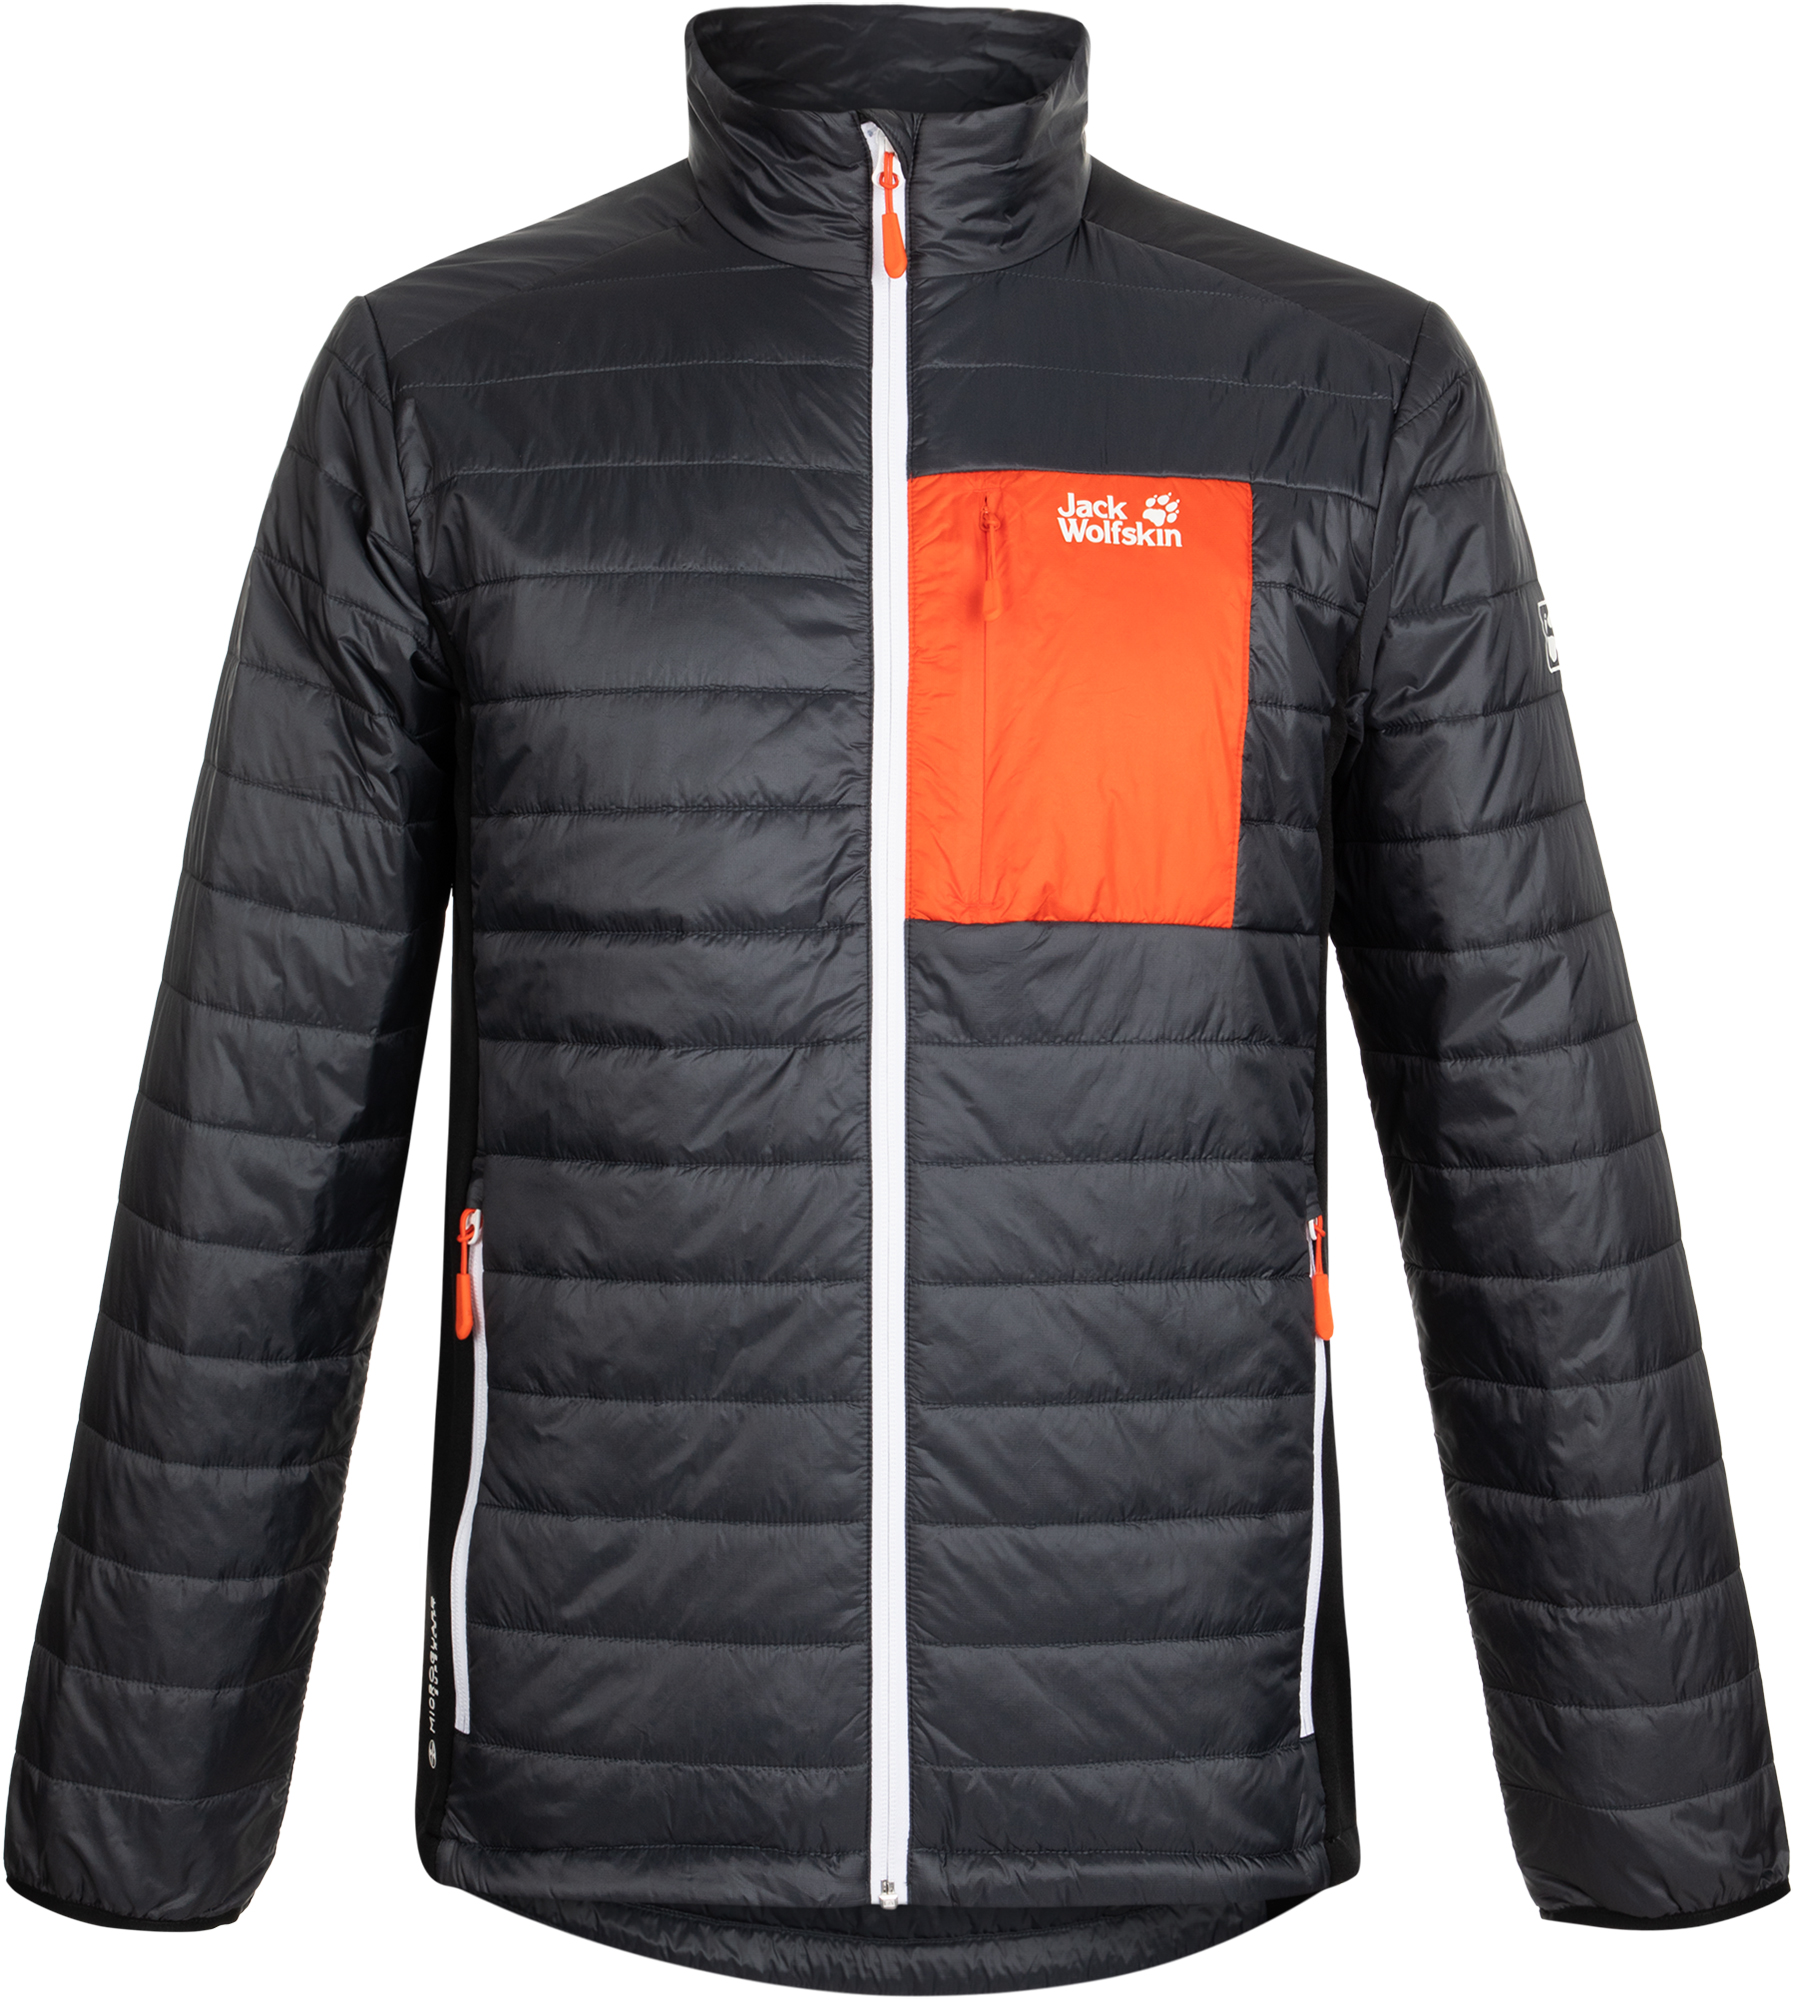 JACK WOLFSKIN Куртка мужская Jack Wolfskin Routeburn, размер 44